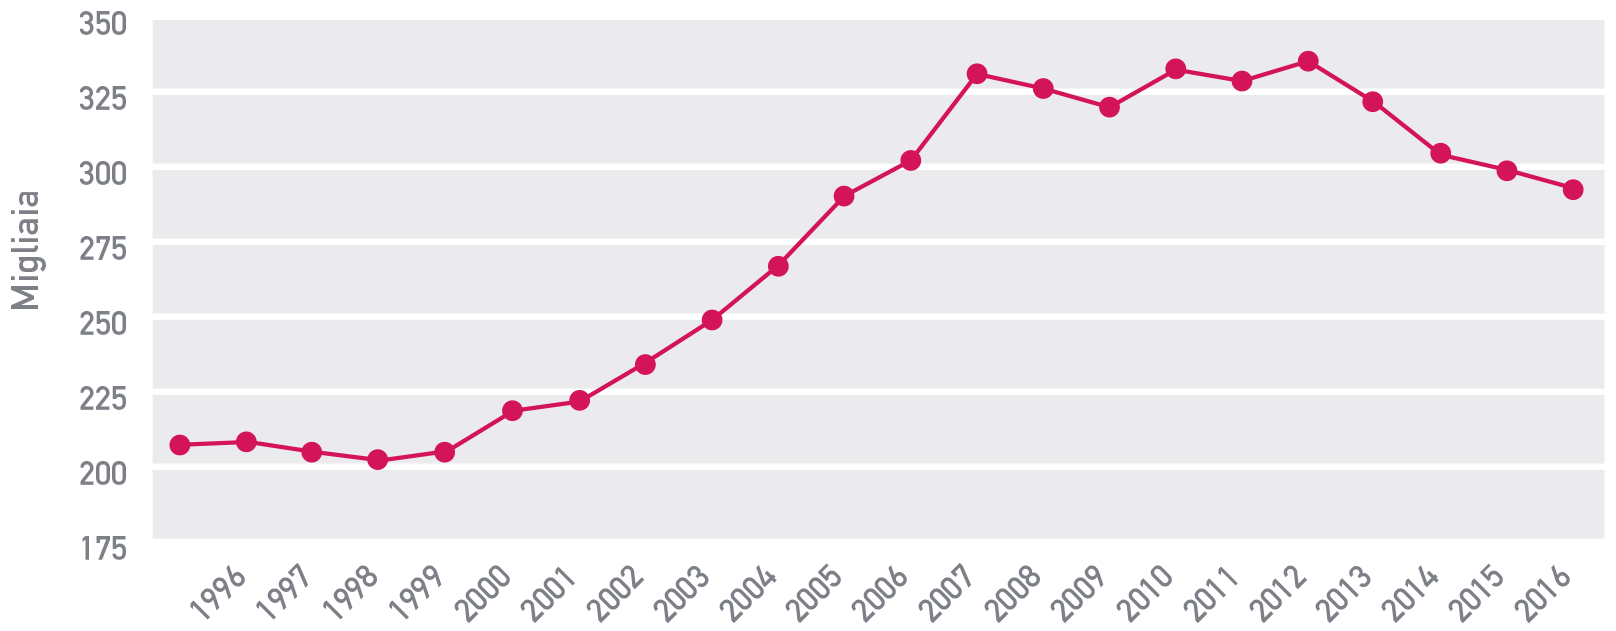 Figura 9 Lasciti ereditari medi: 1995- 2016